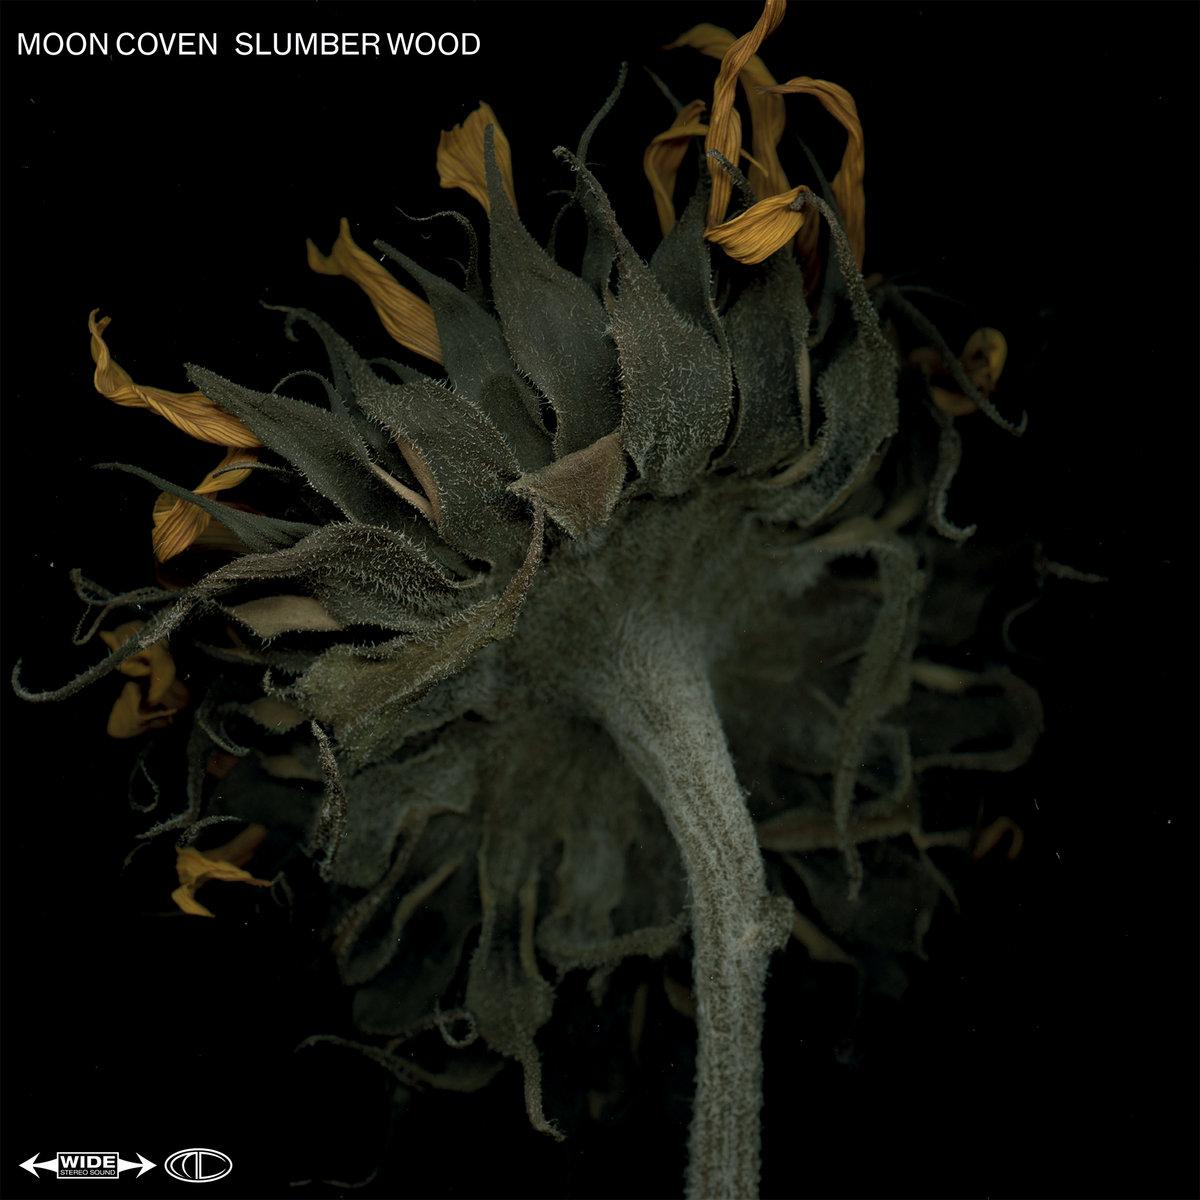 Reseña: MOON COVEN.- 'SlumberWood'